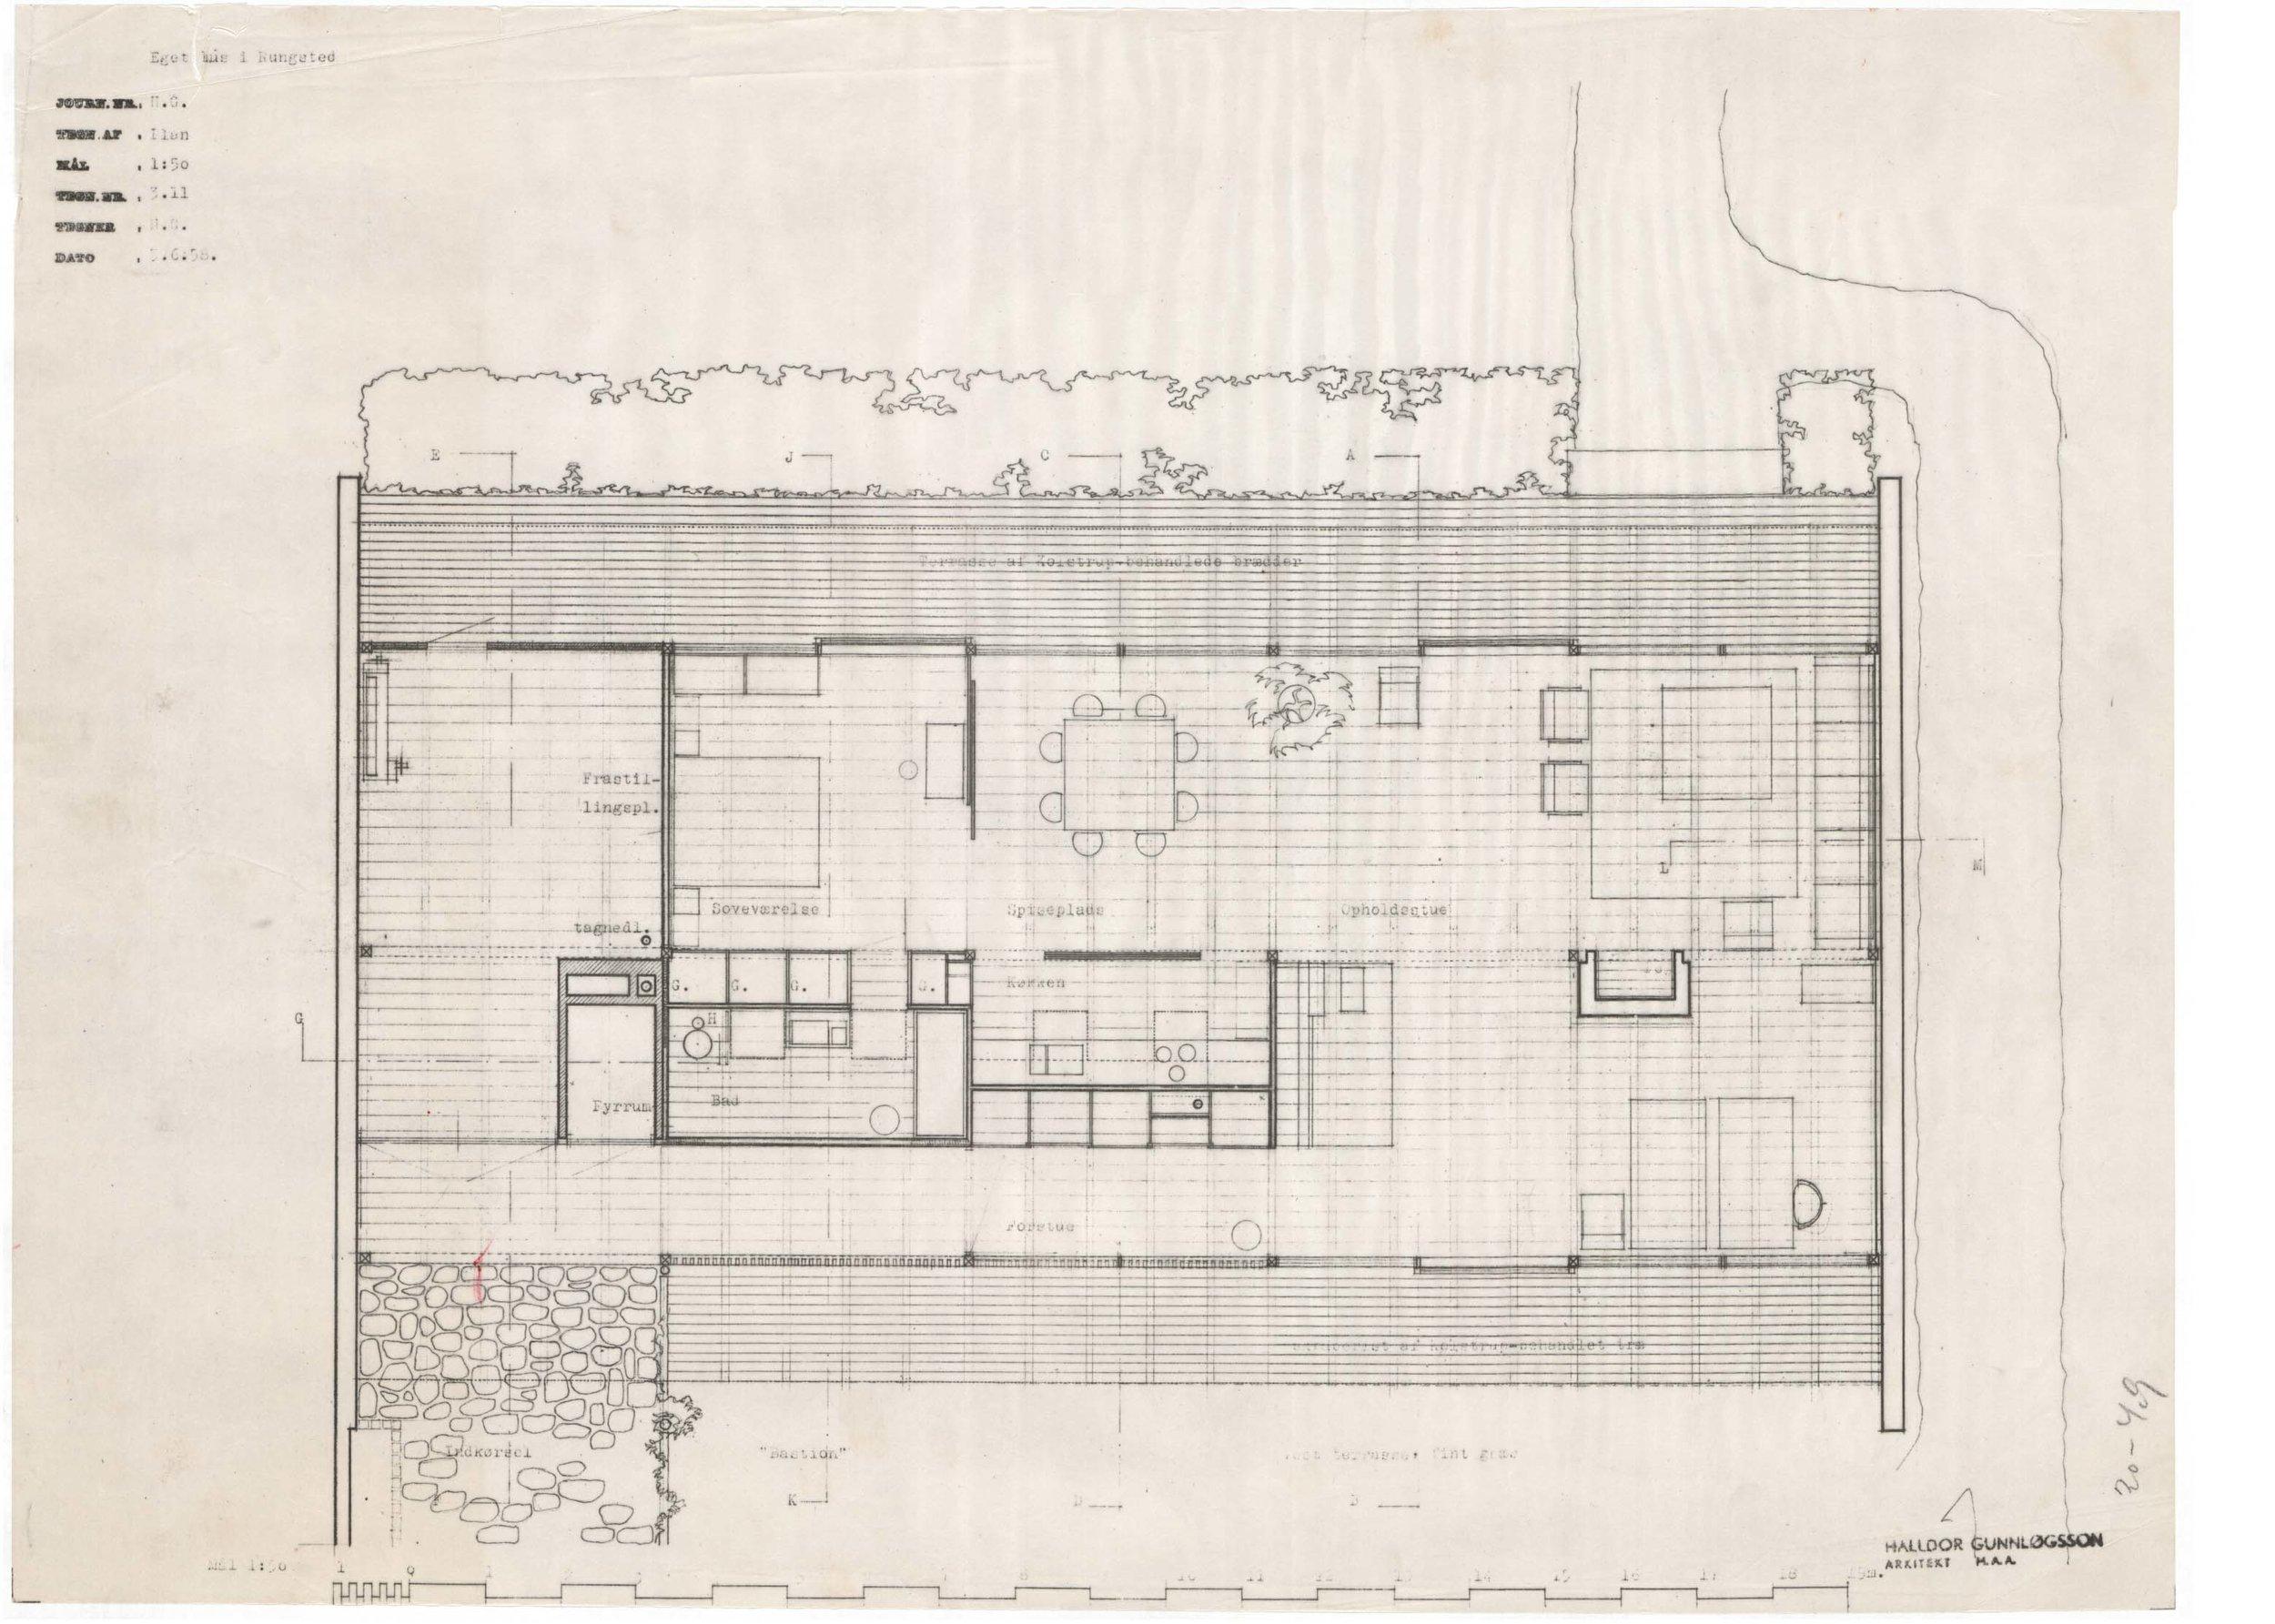 Plan. Gunnløgssons eget hus, Rungsted, 1958